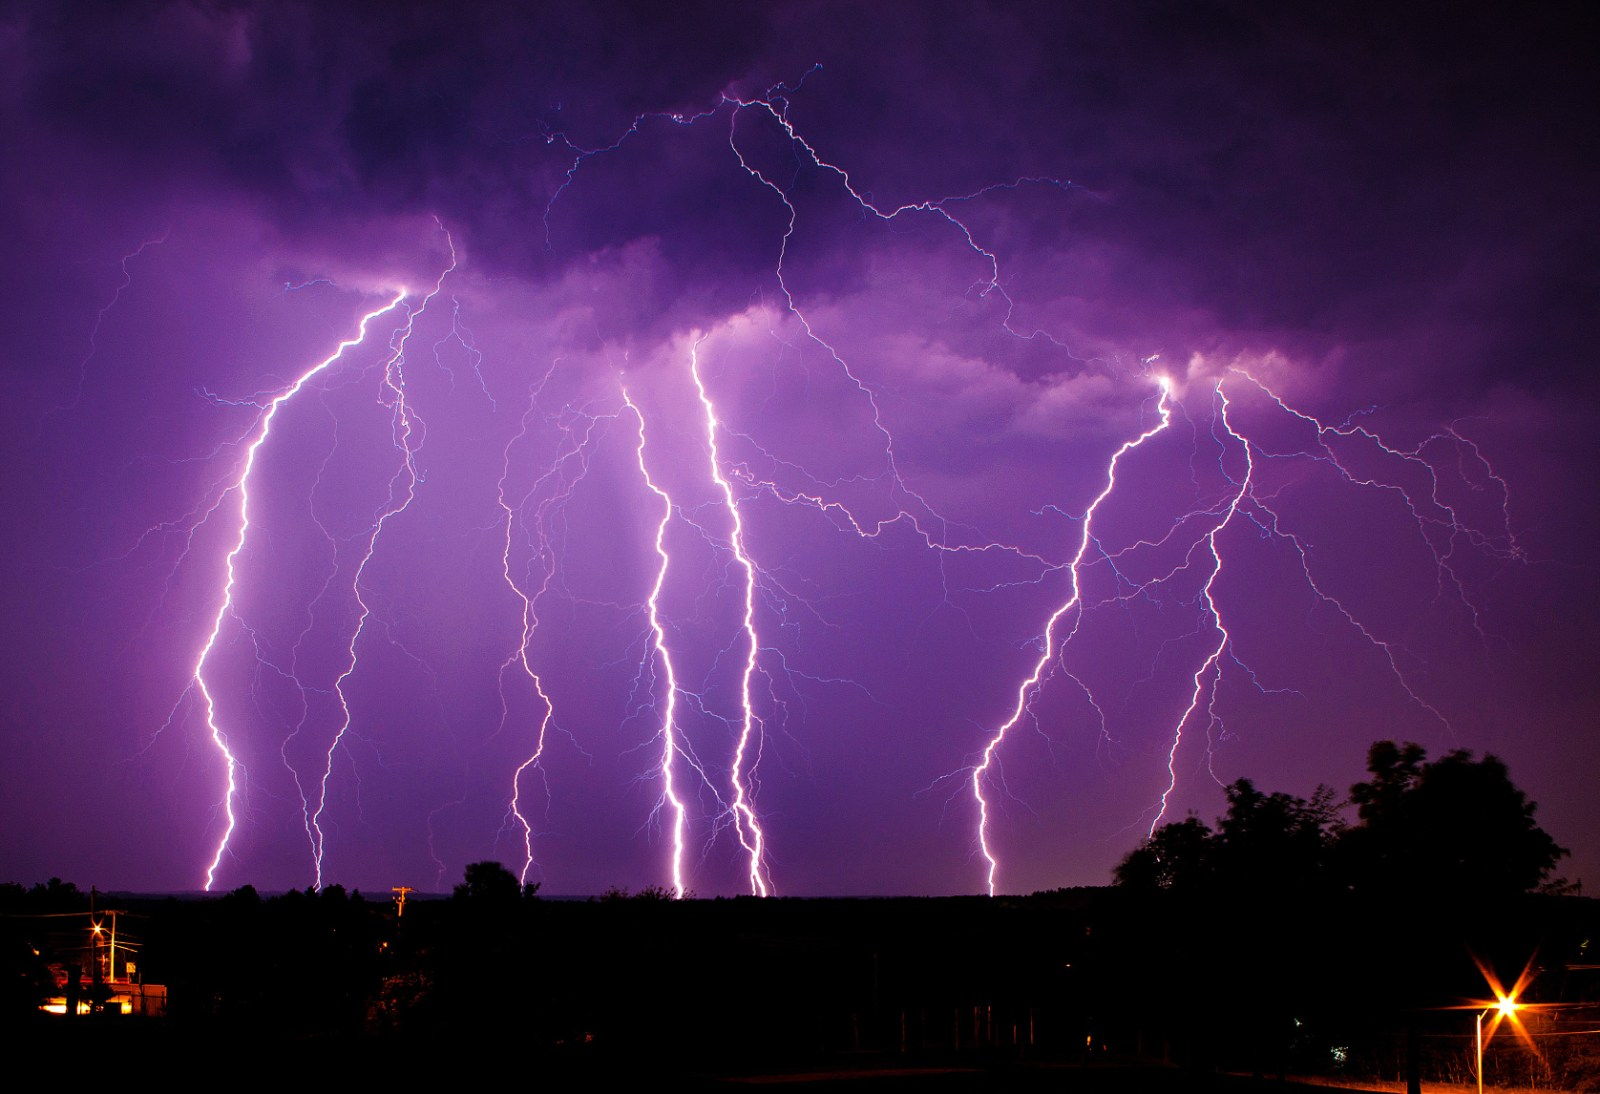 Lightning thunderstorm during the night